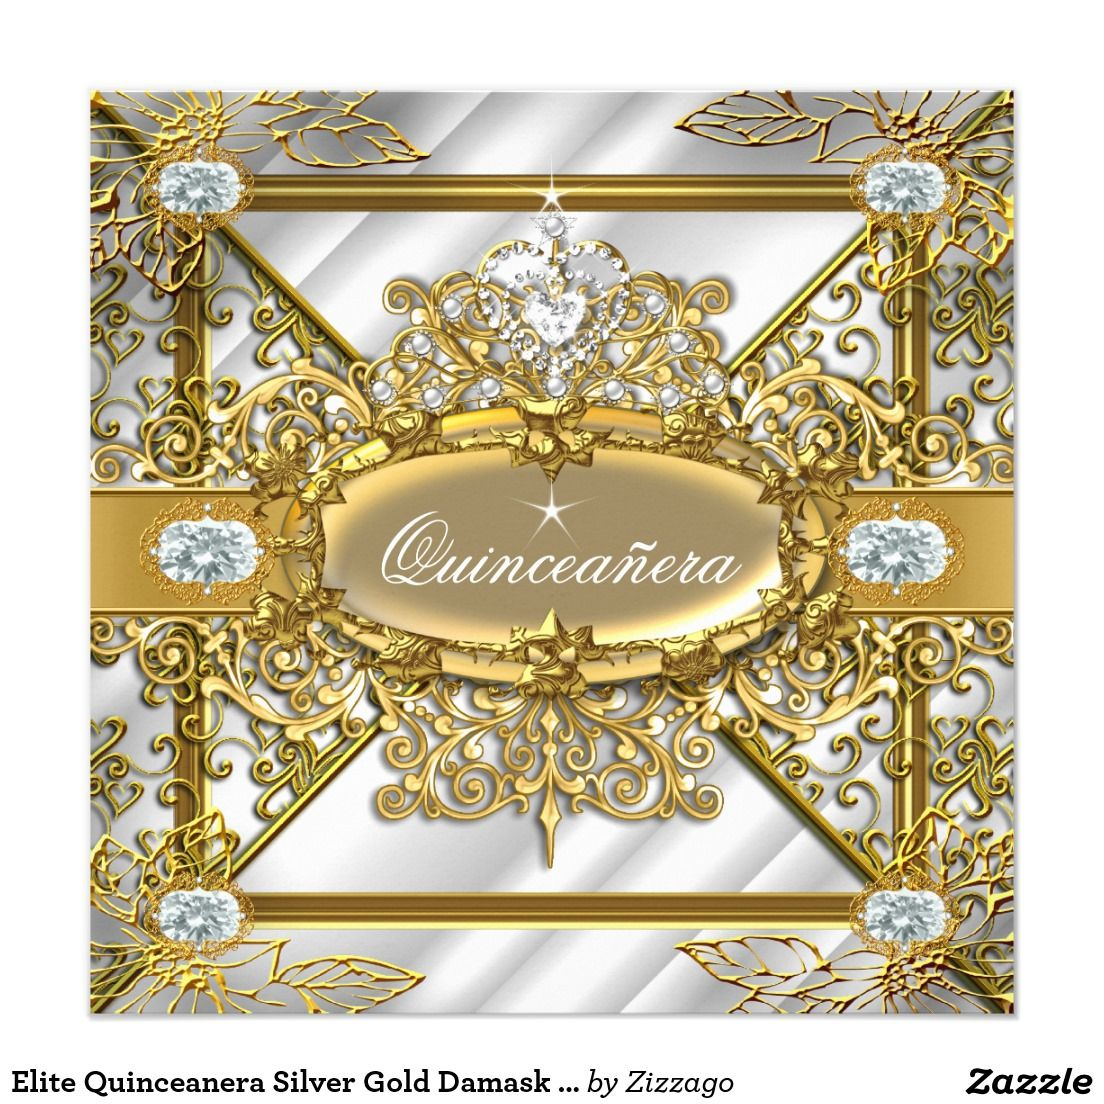 Elite Quinceanera Silver Gold Damask 15th Birthday Invitation ...